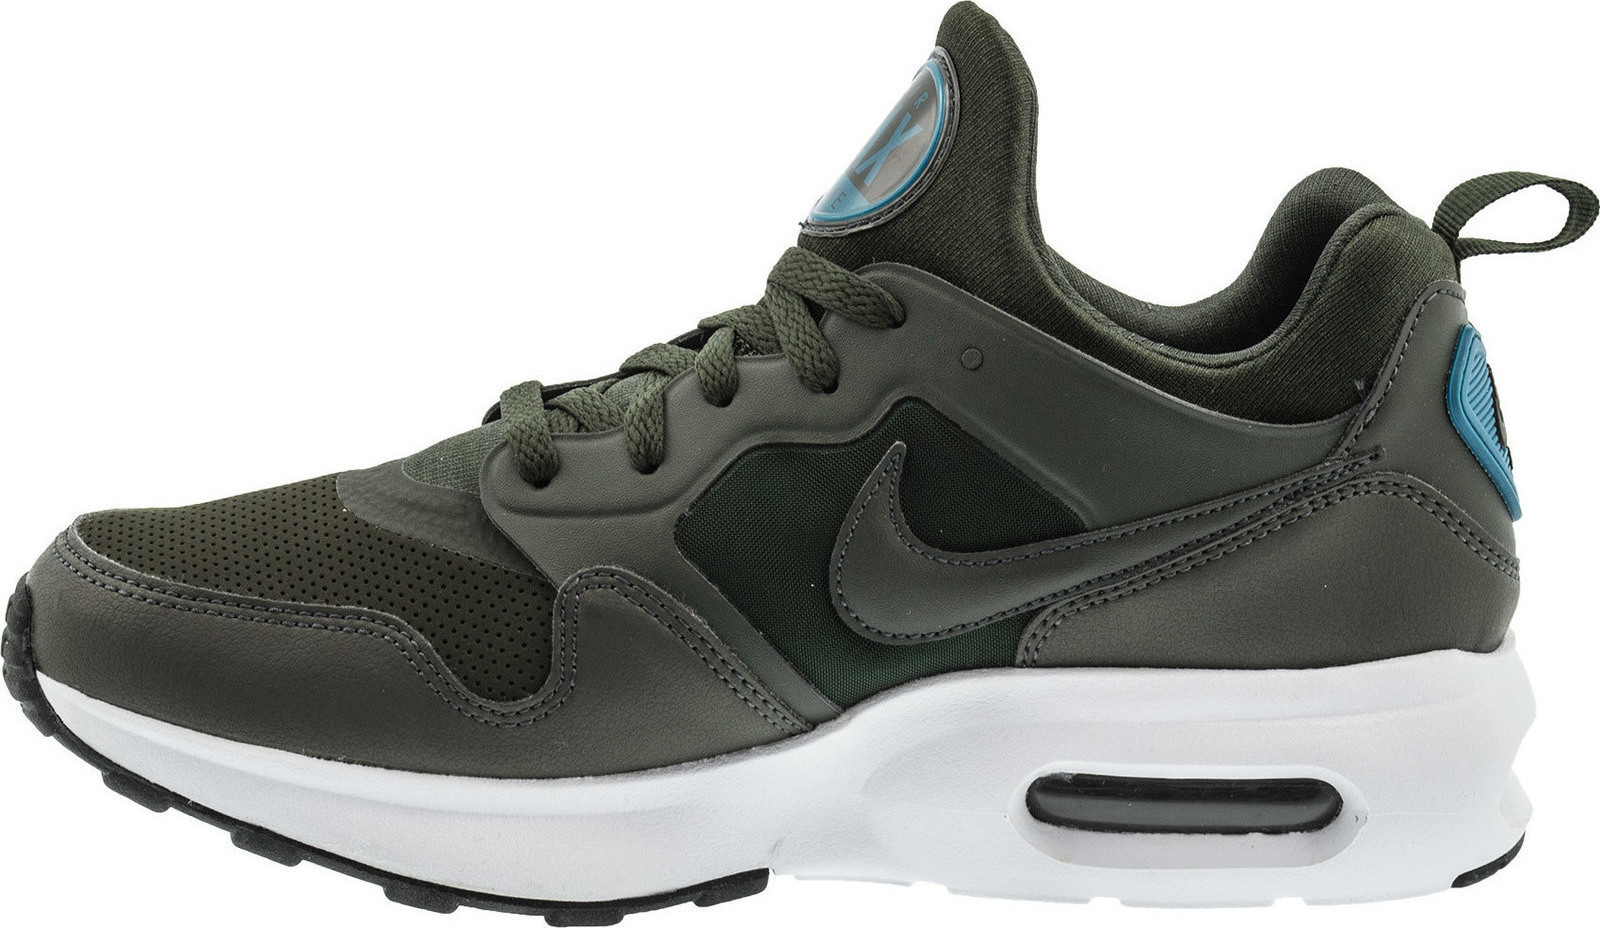 quality design 959b0 d291c Προσθήκη στα αγαπημένα menu Nike Air Max Prime 876069-300